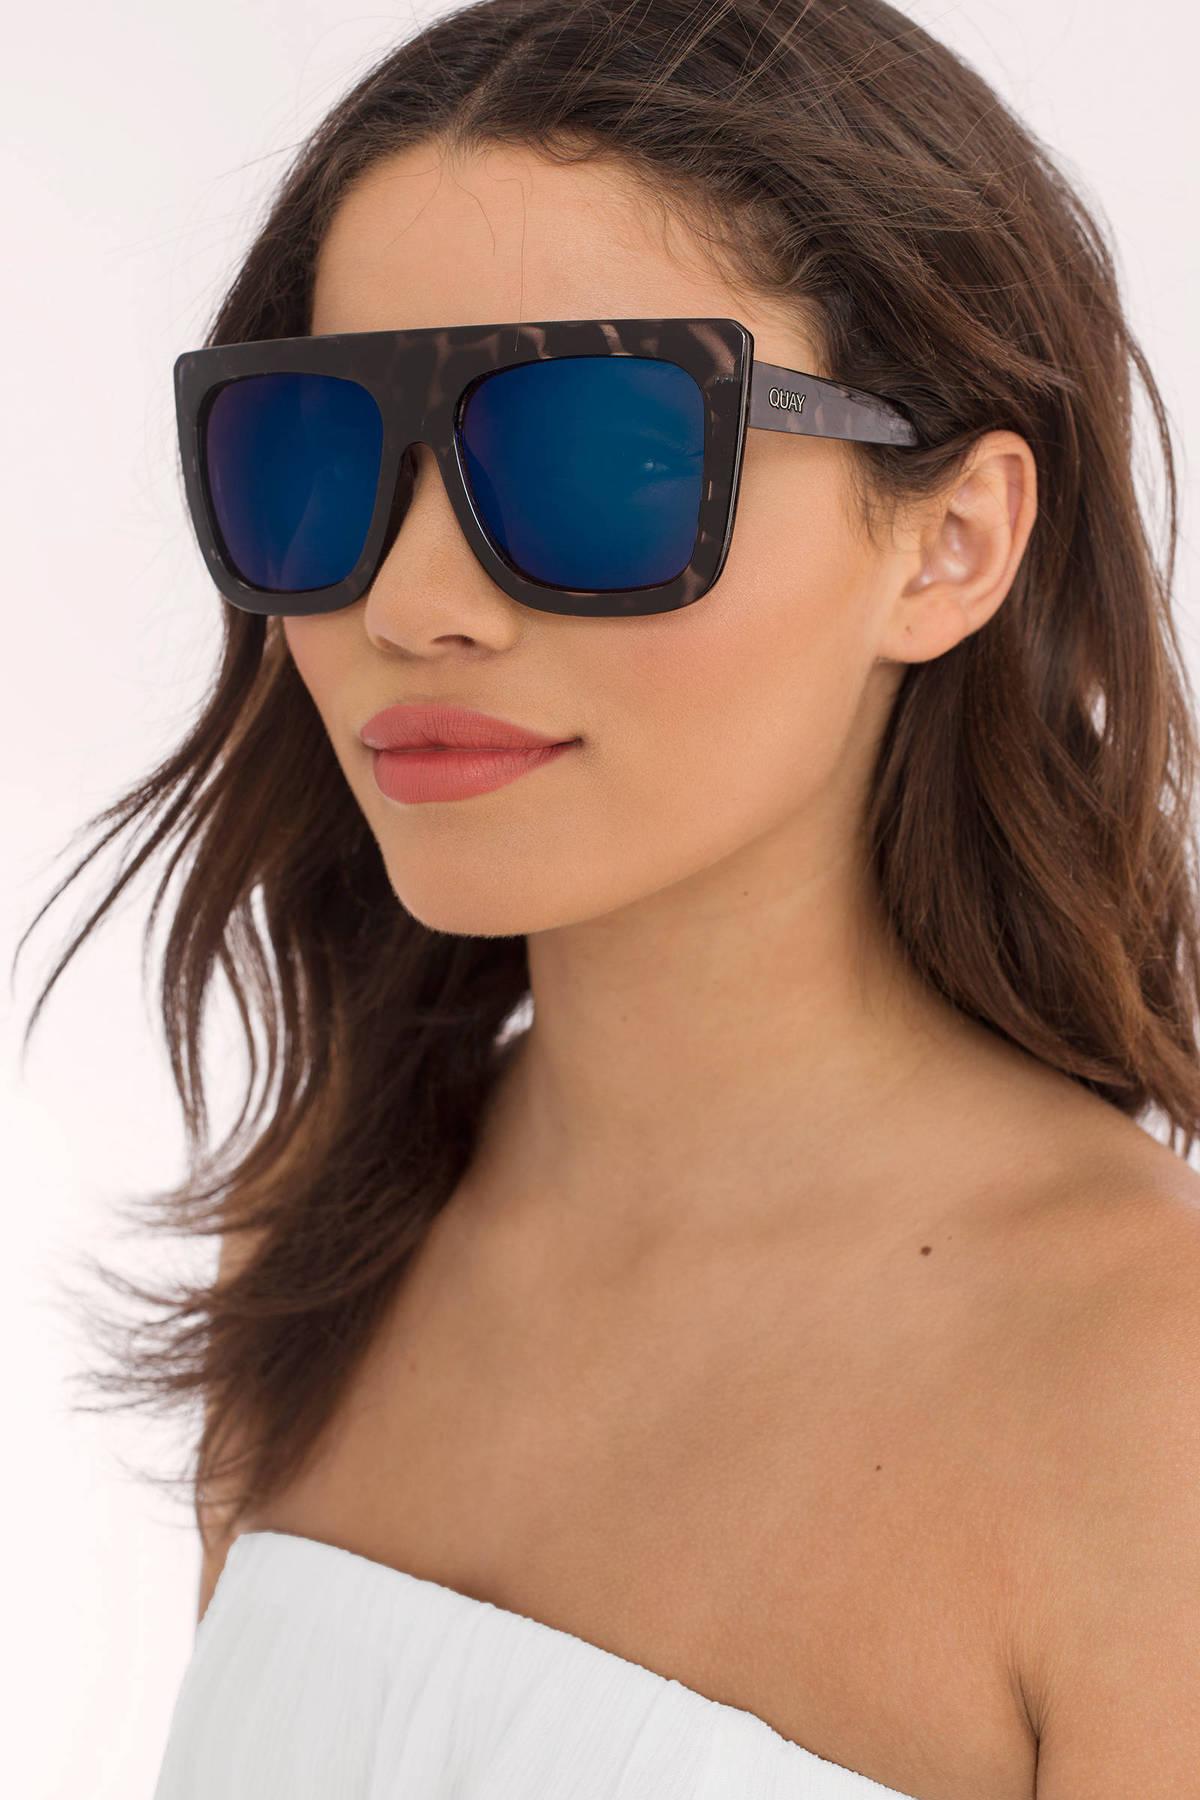 833ef31c75 Quay Cafe Racer Black Tortoise Blue Oversized Sunglasses 5600 Tobi ...